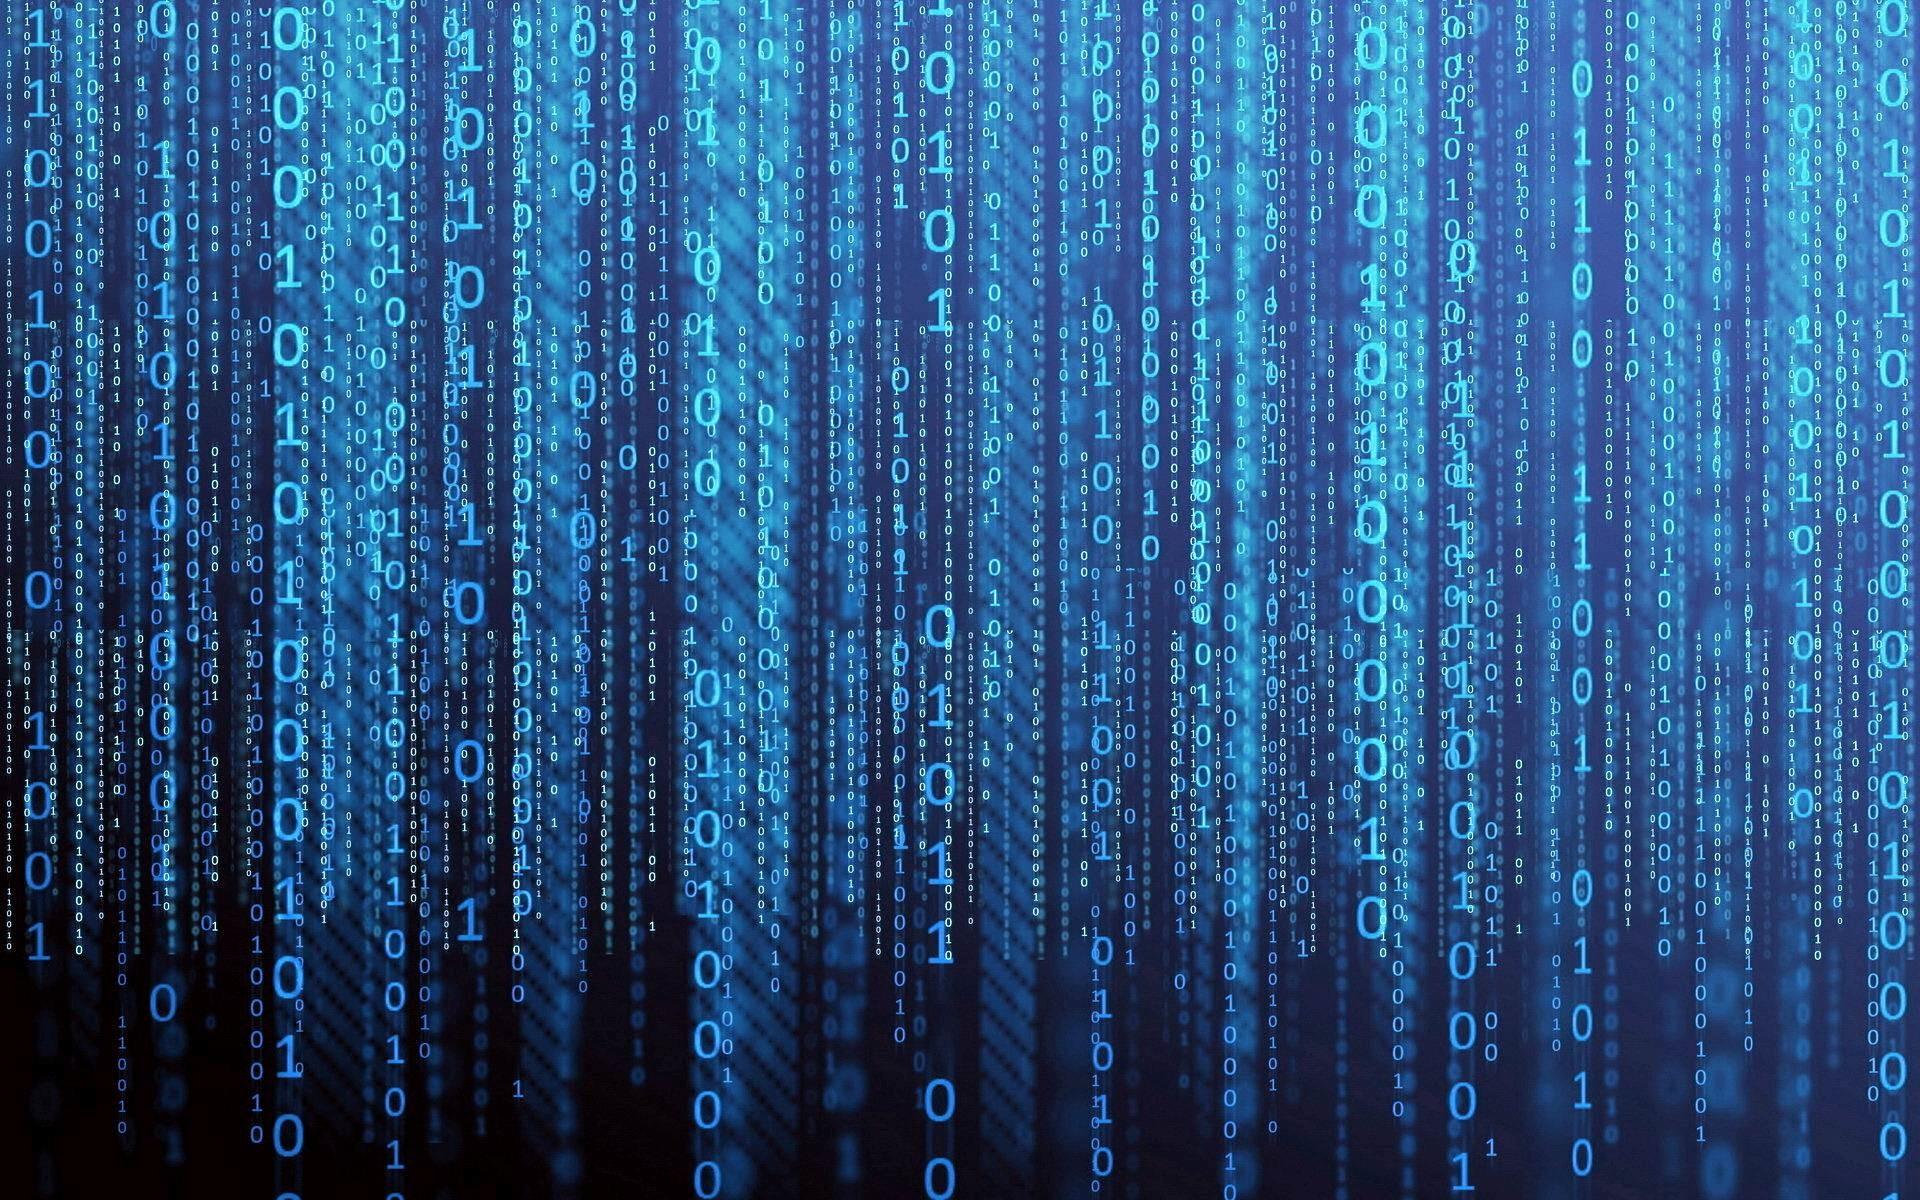 Matrix binary code wallpaper